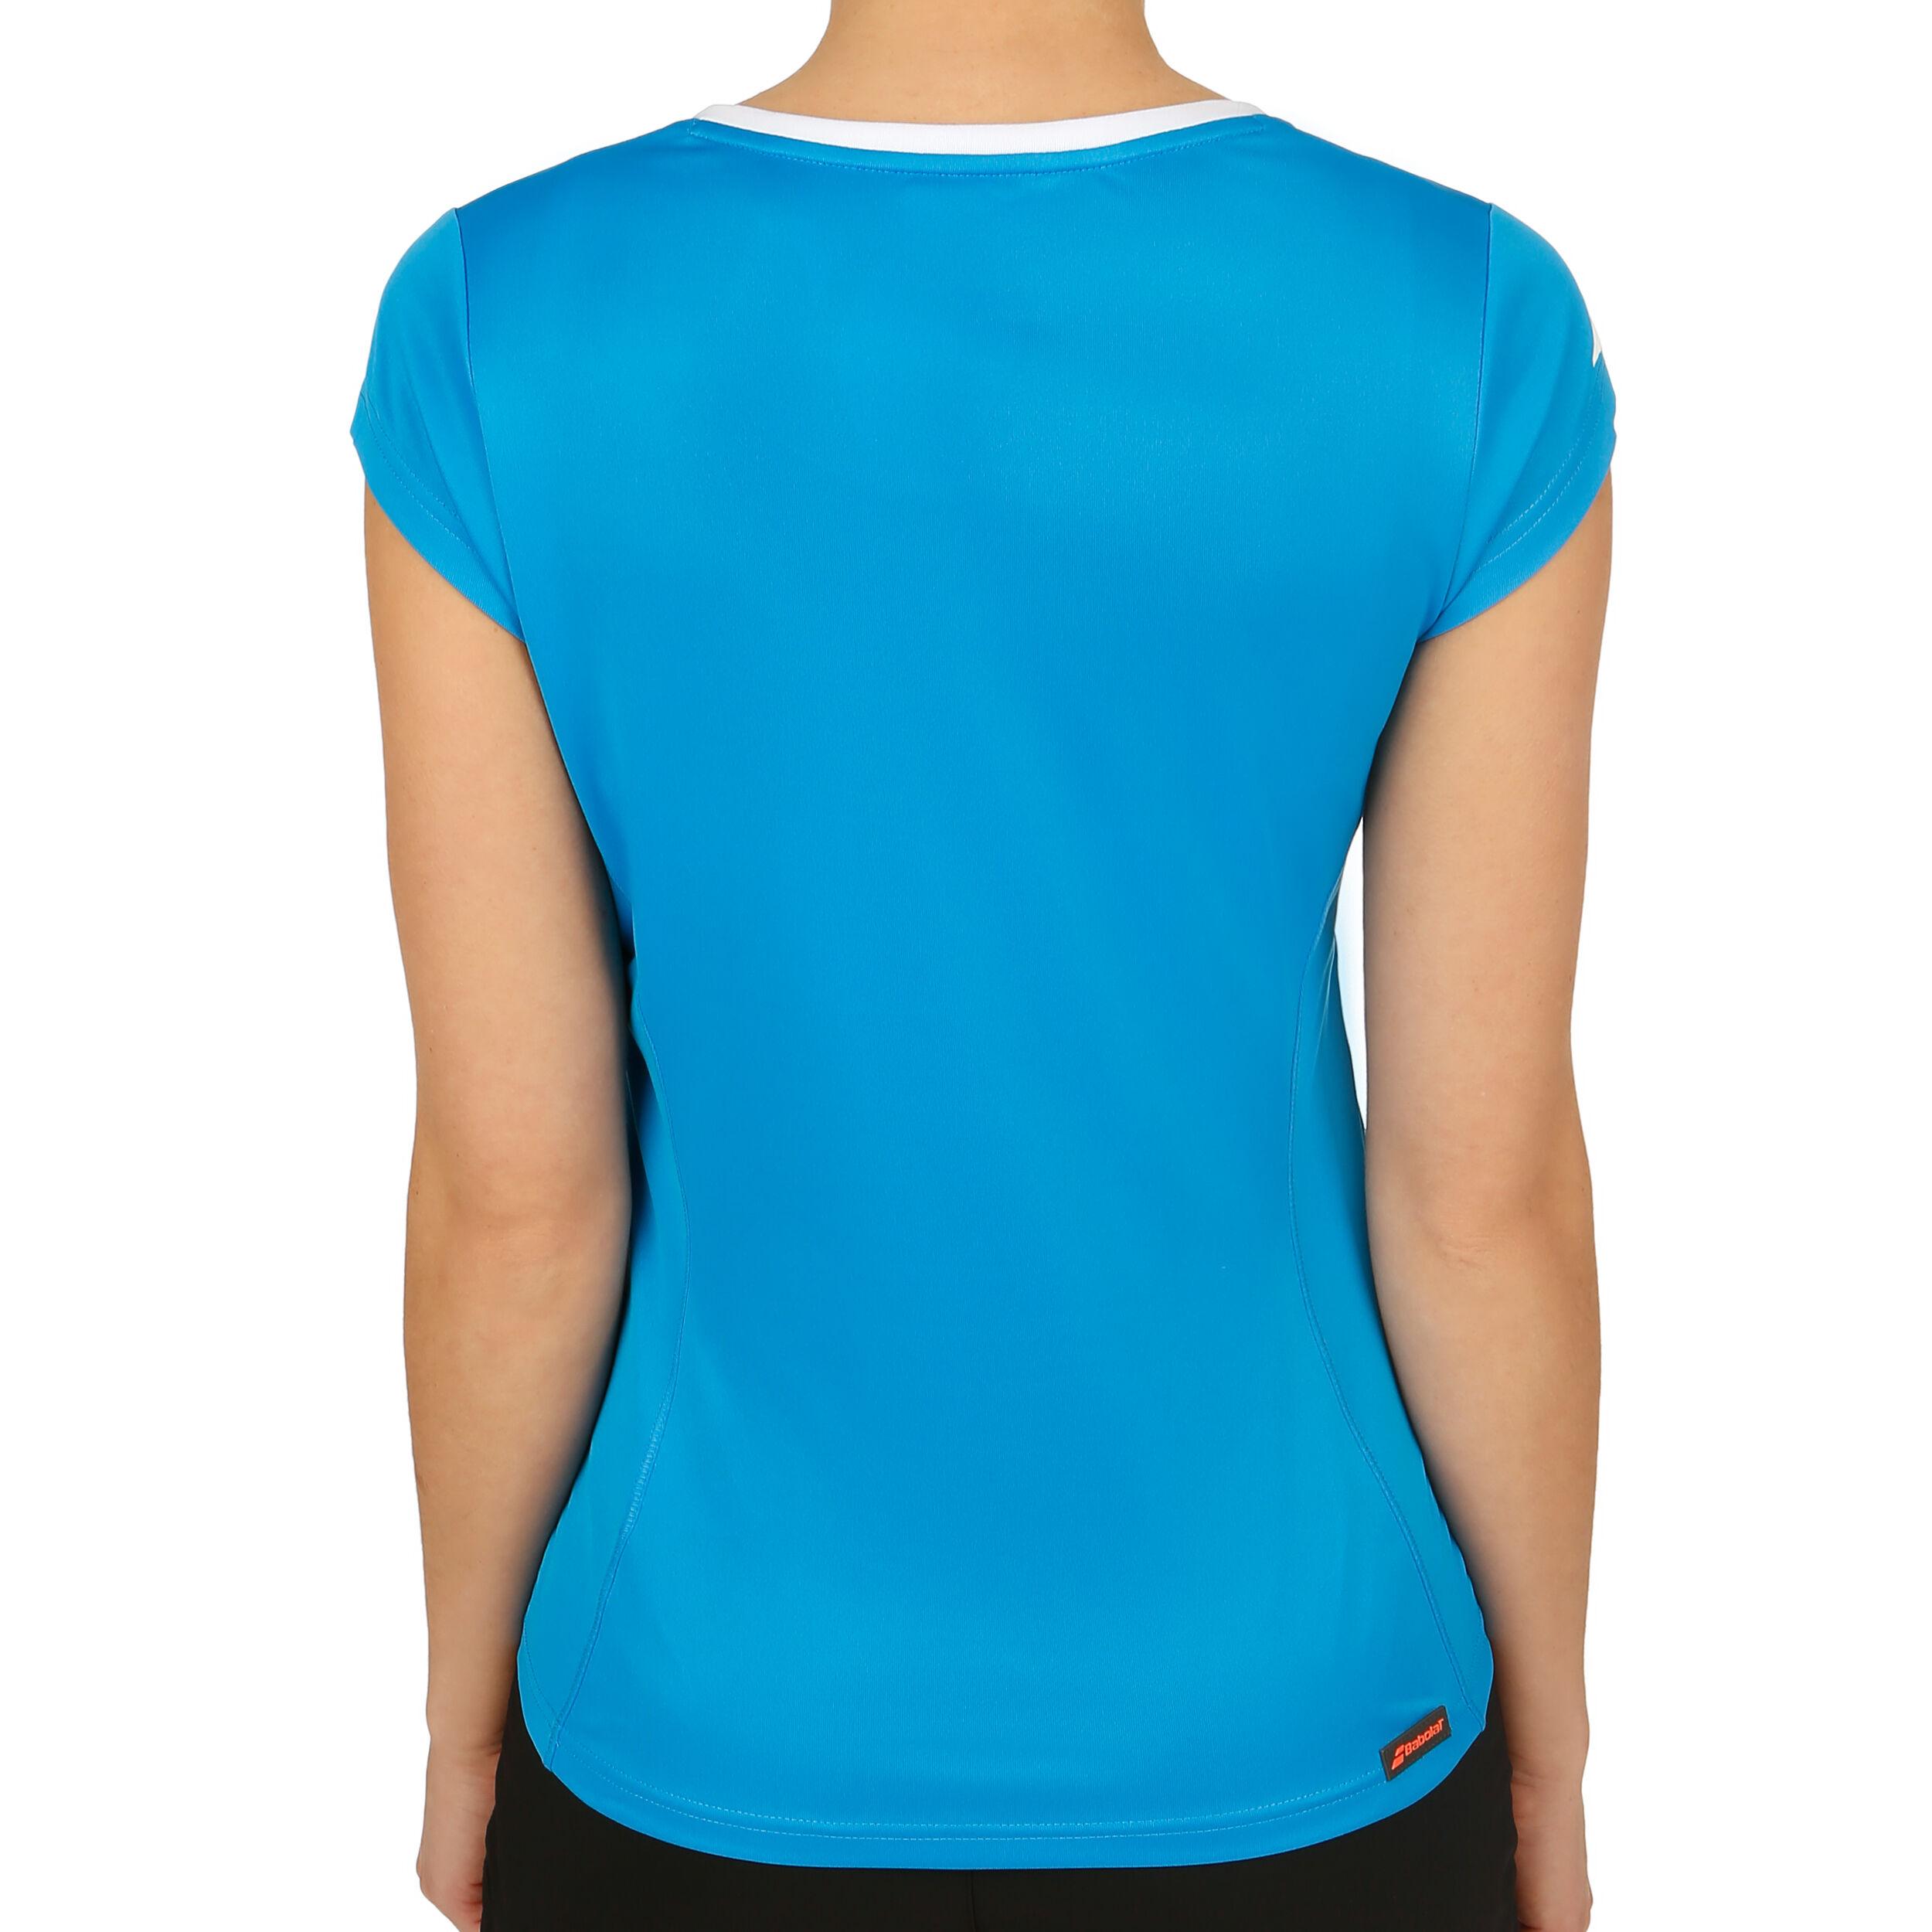 Babolat Core Flag Club T Shirt Damen Blau, Weiß online